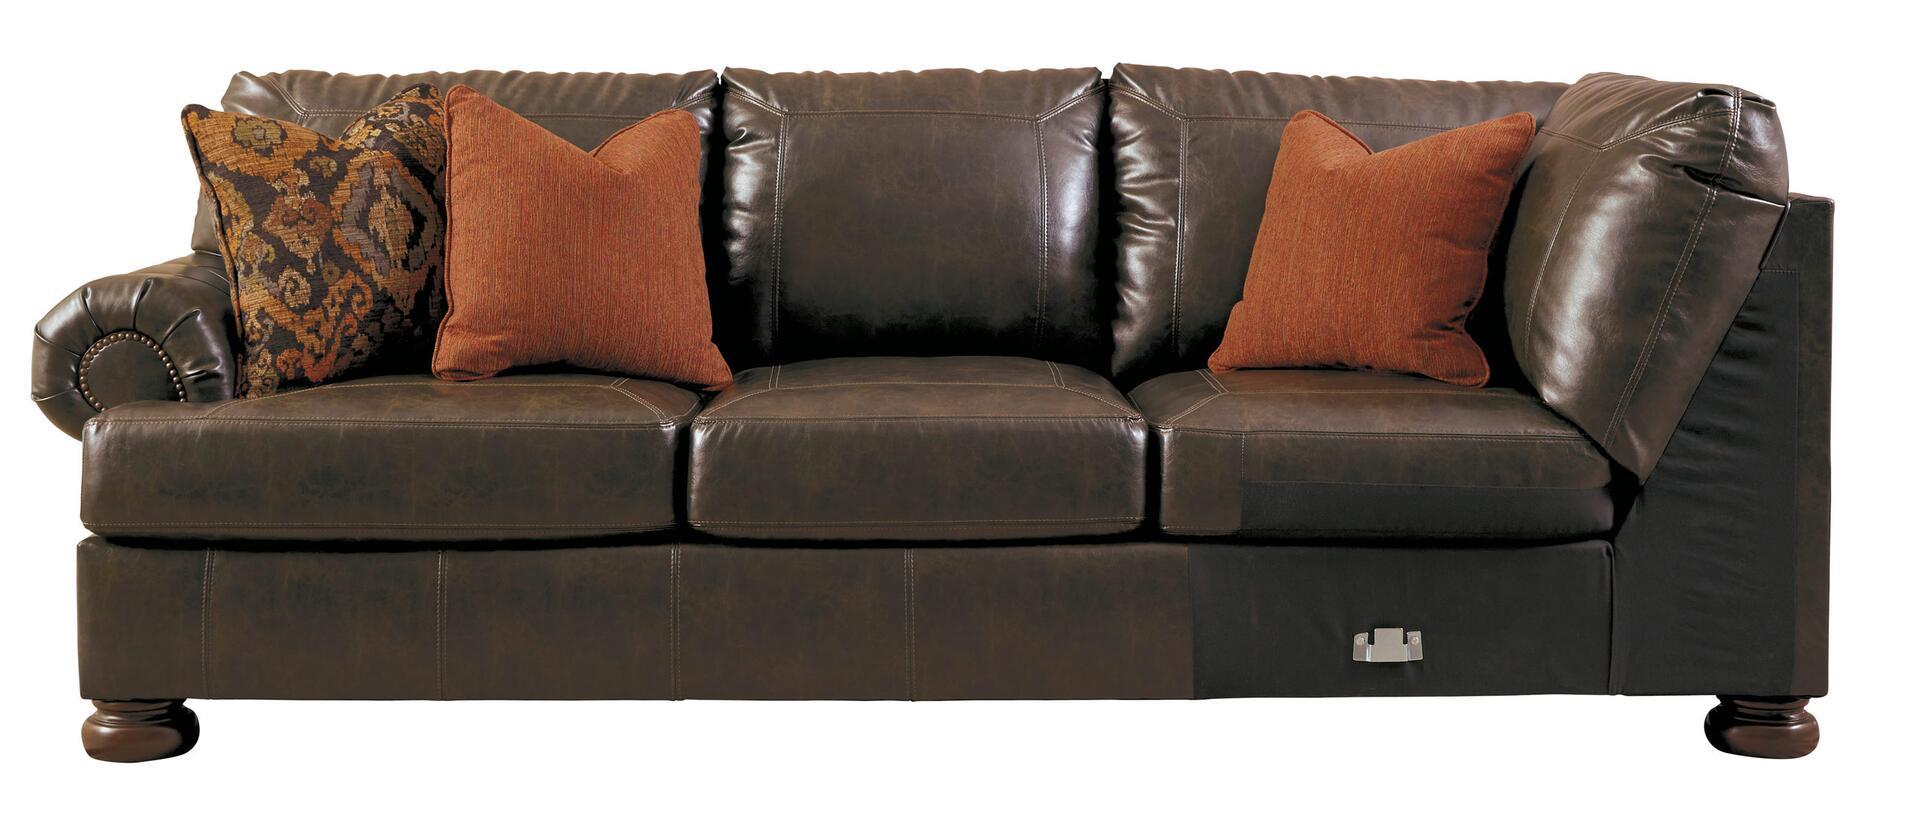 left arm return sofa best brand in singapore benchcraft 316005666 nesbit durablend series stationary ...